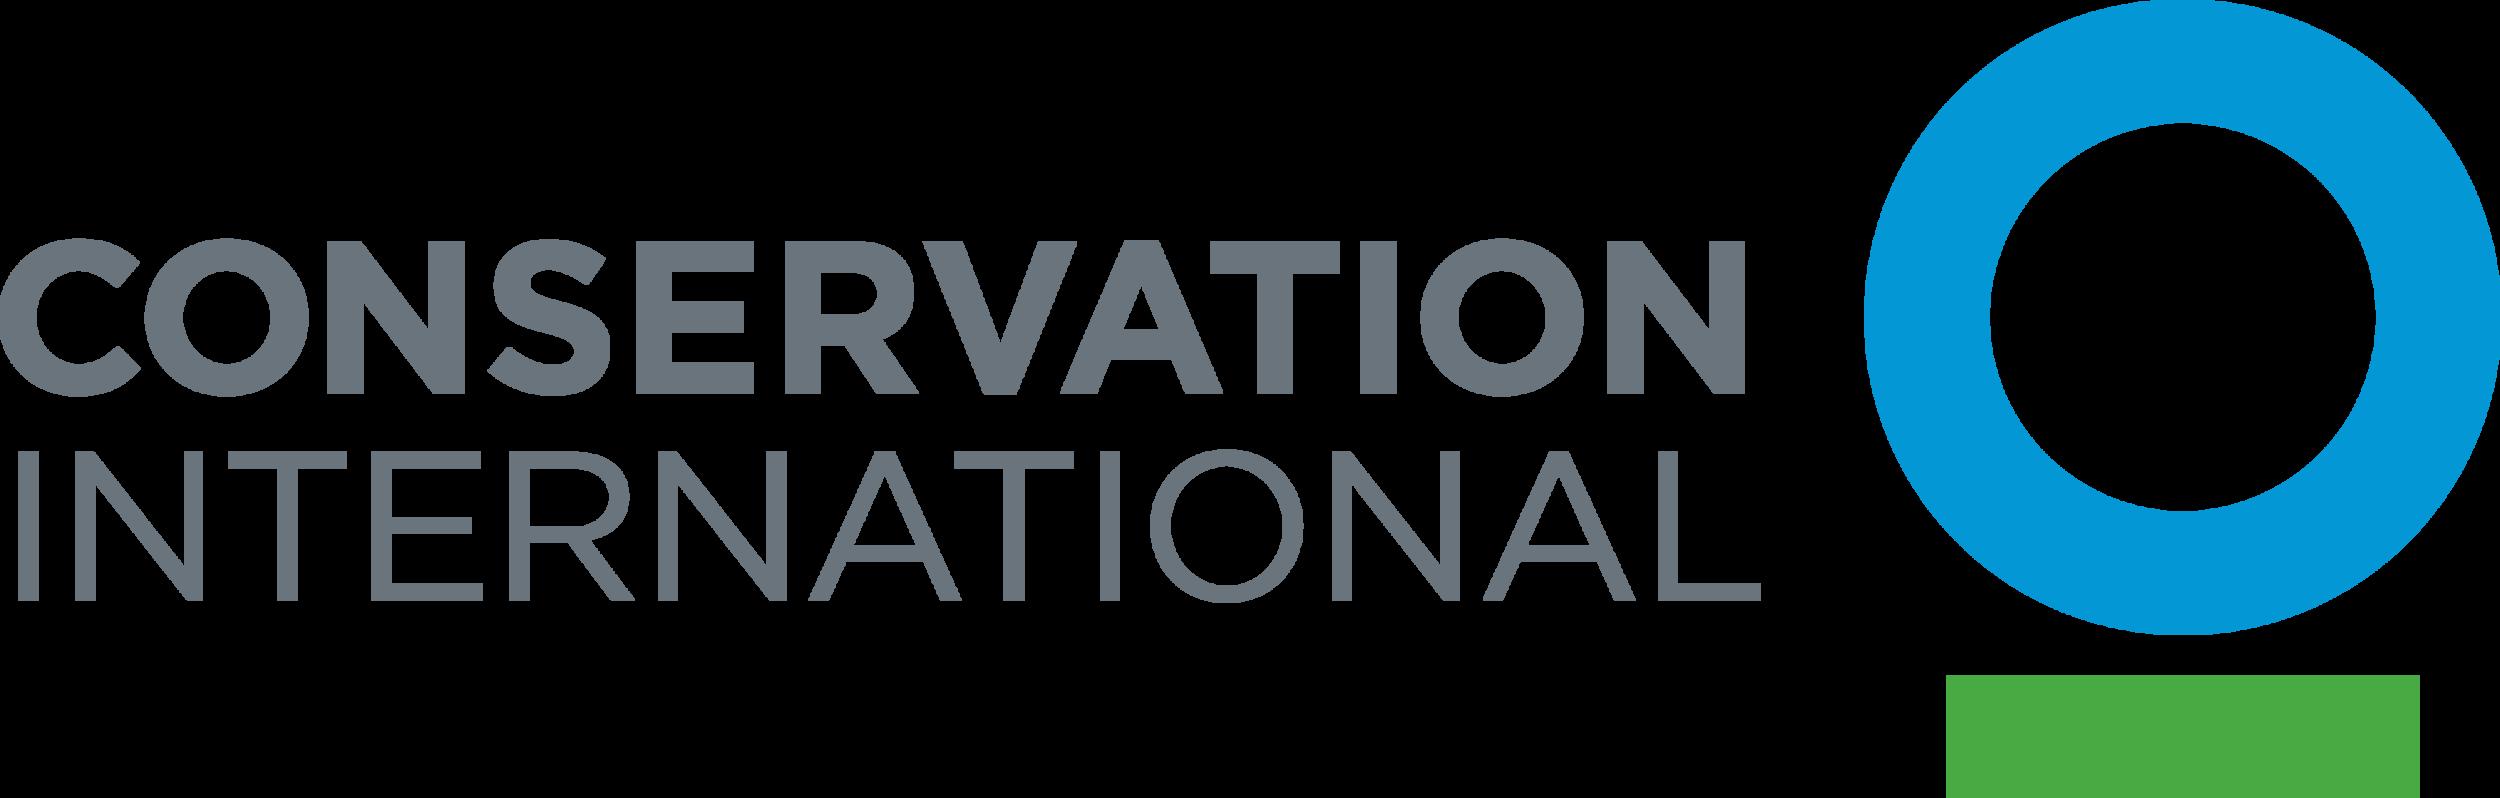 Conservation International.png